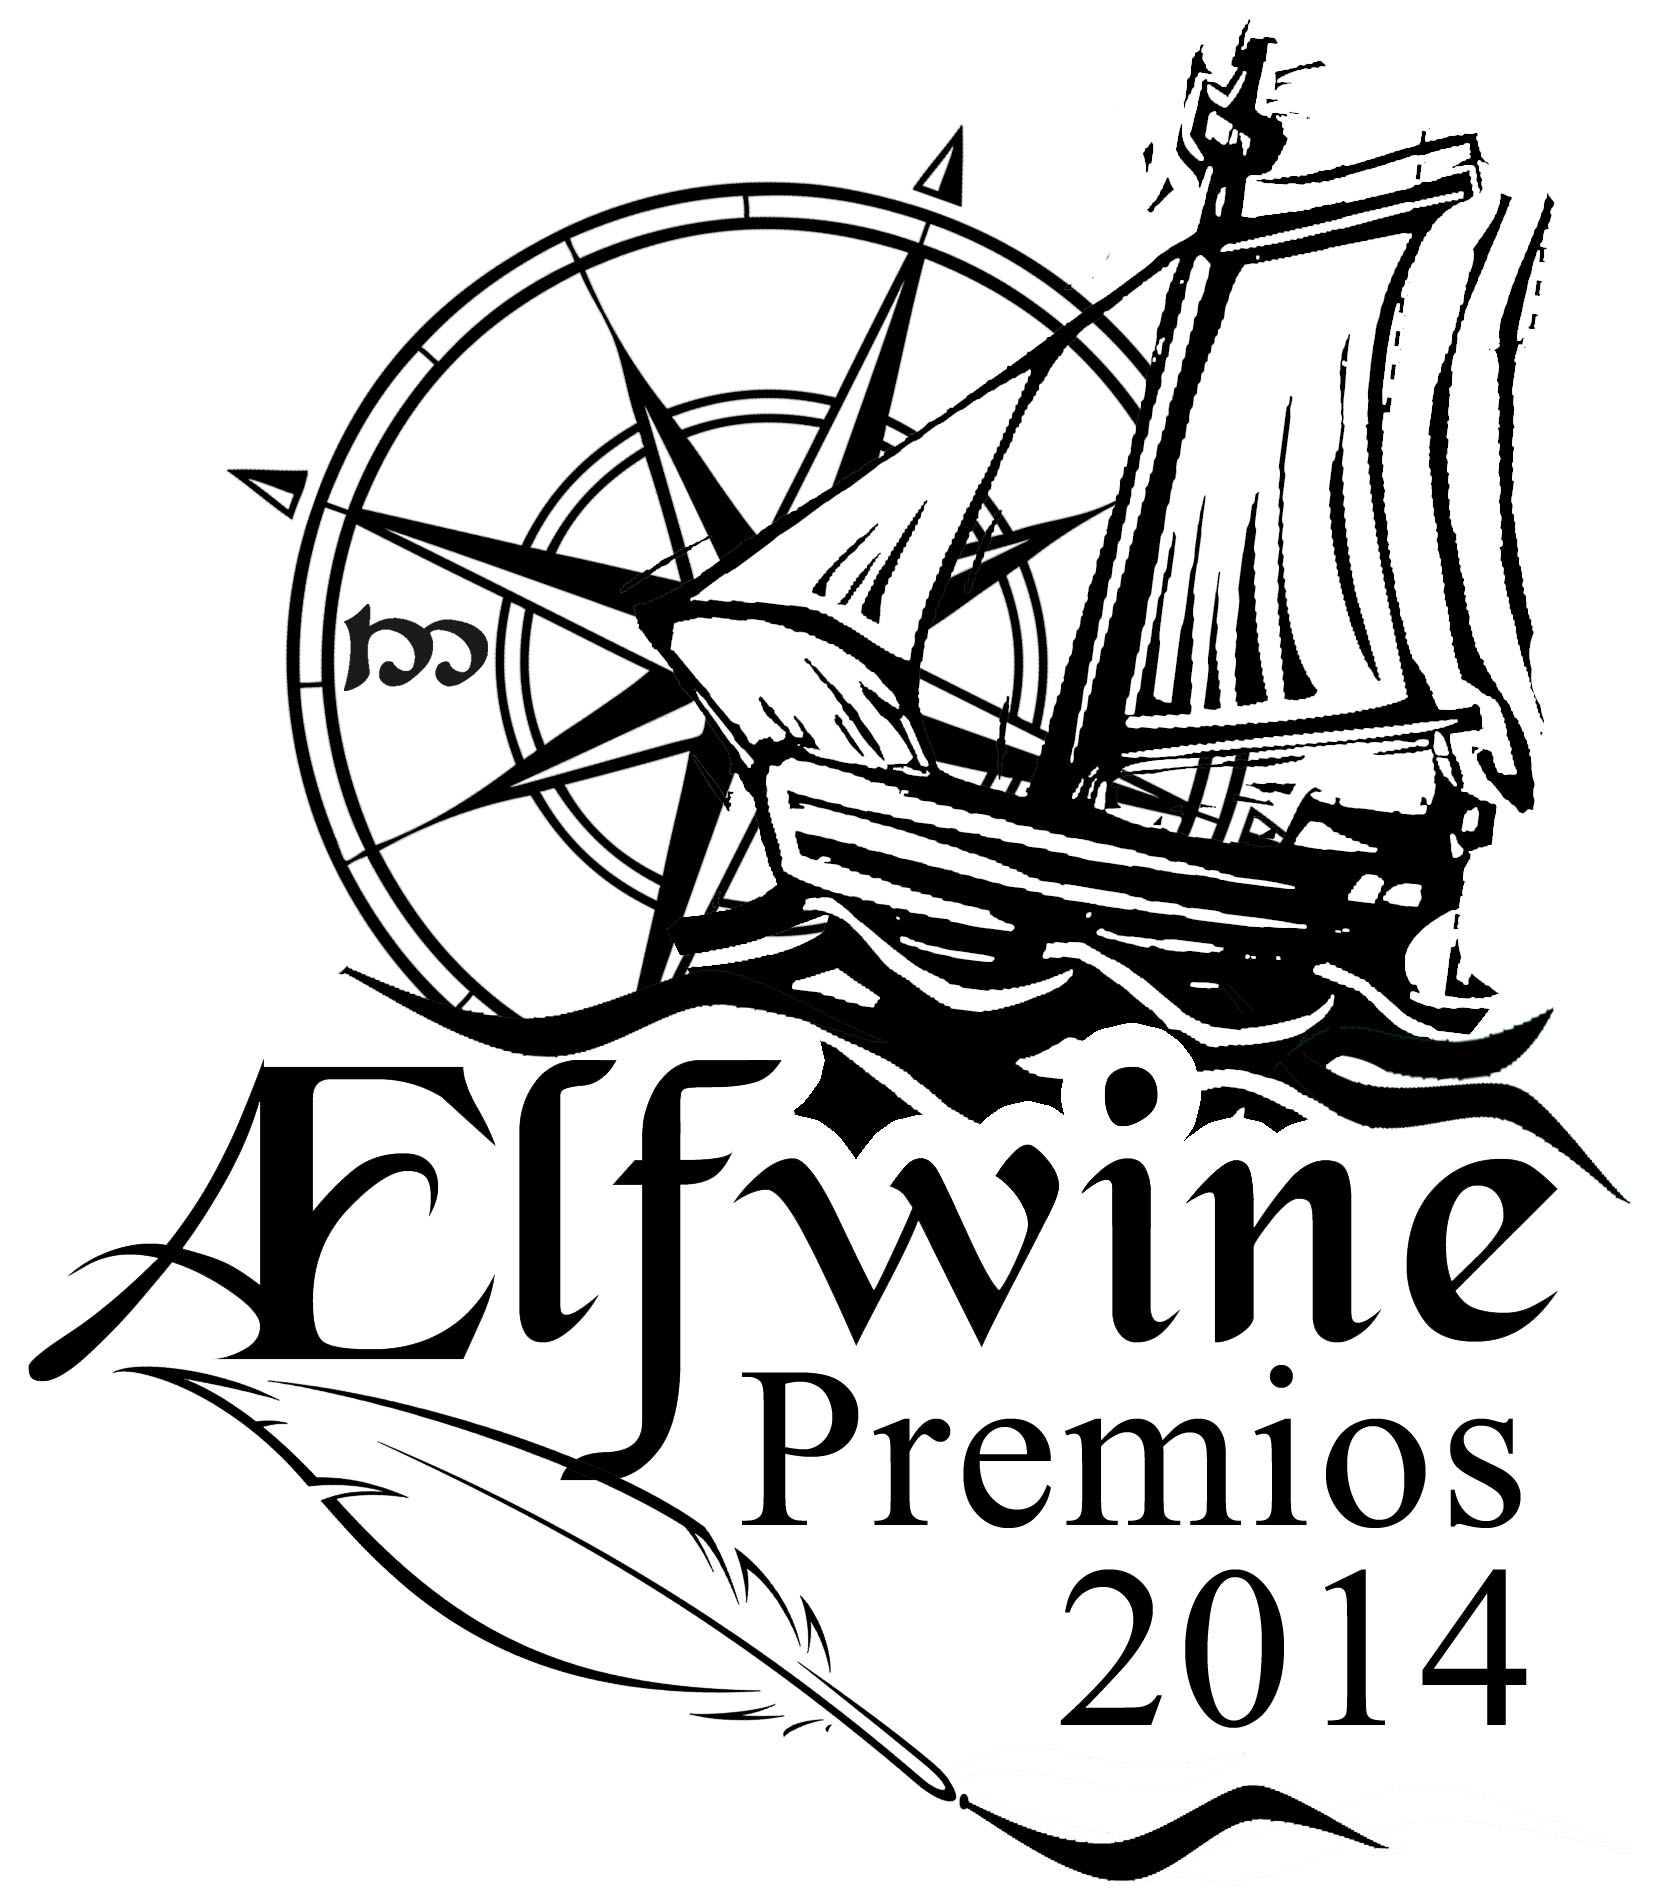 Spanish Tolkien Society announces Ælfwine Awards 2014